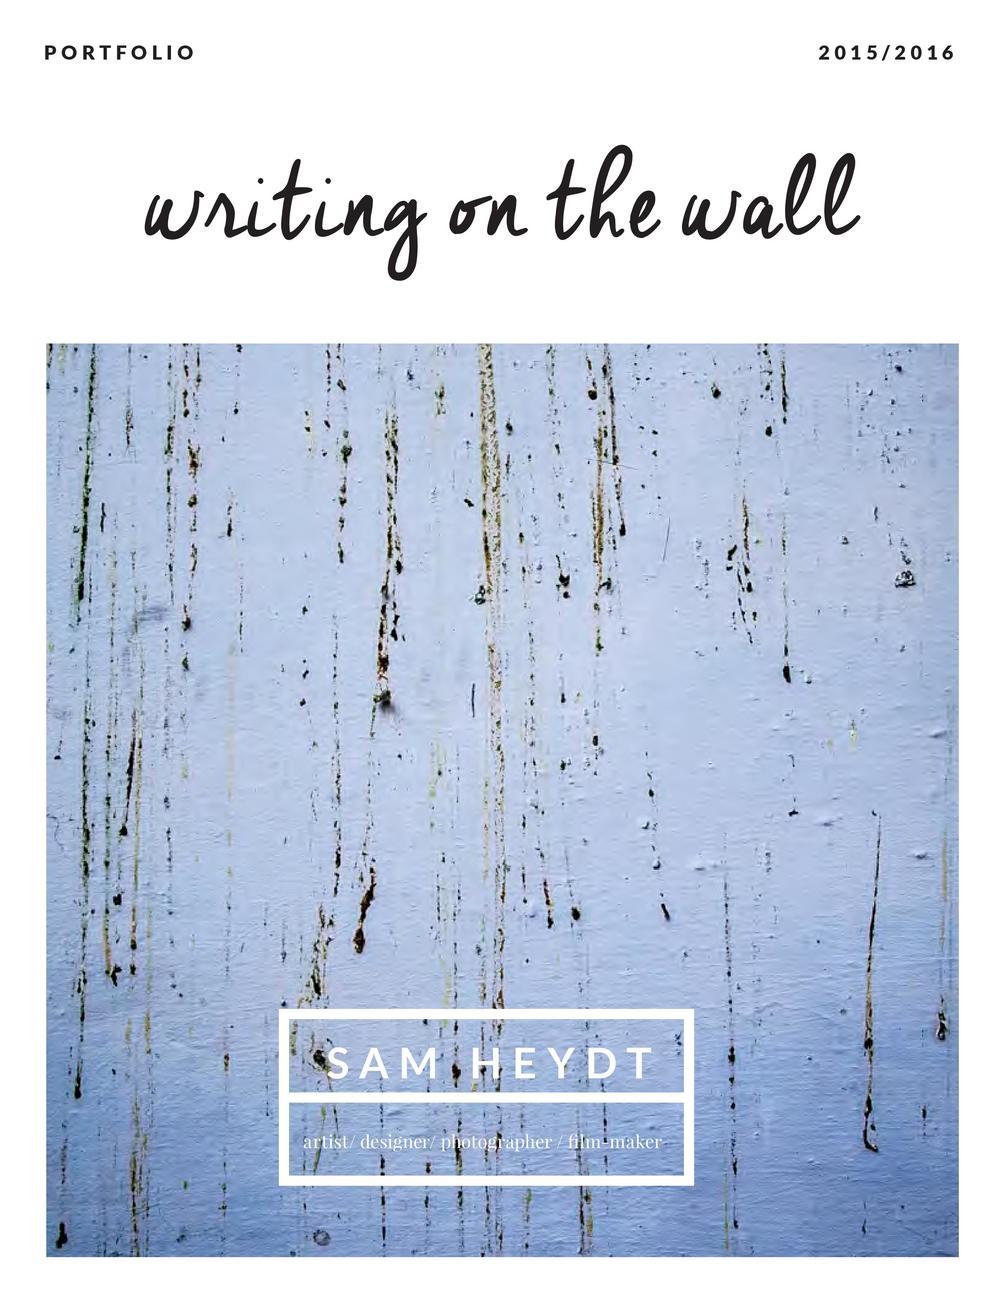 WritingOnWall-Catalog-HEYDT-email-page-003.jpg